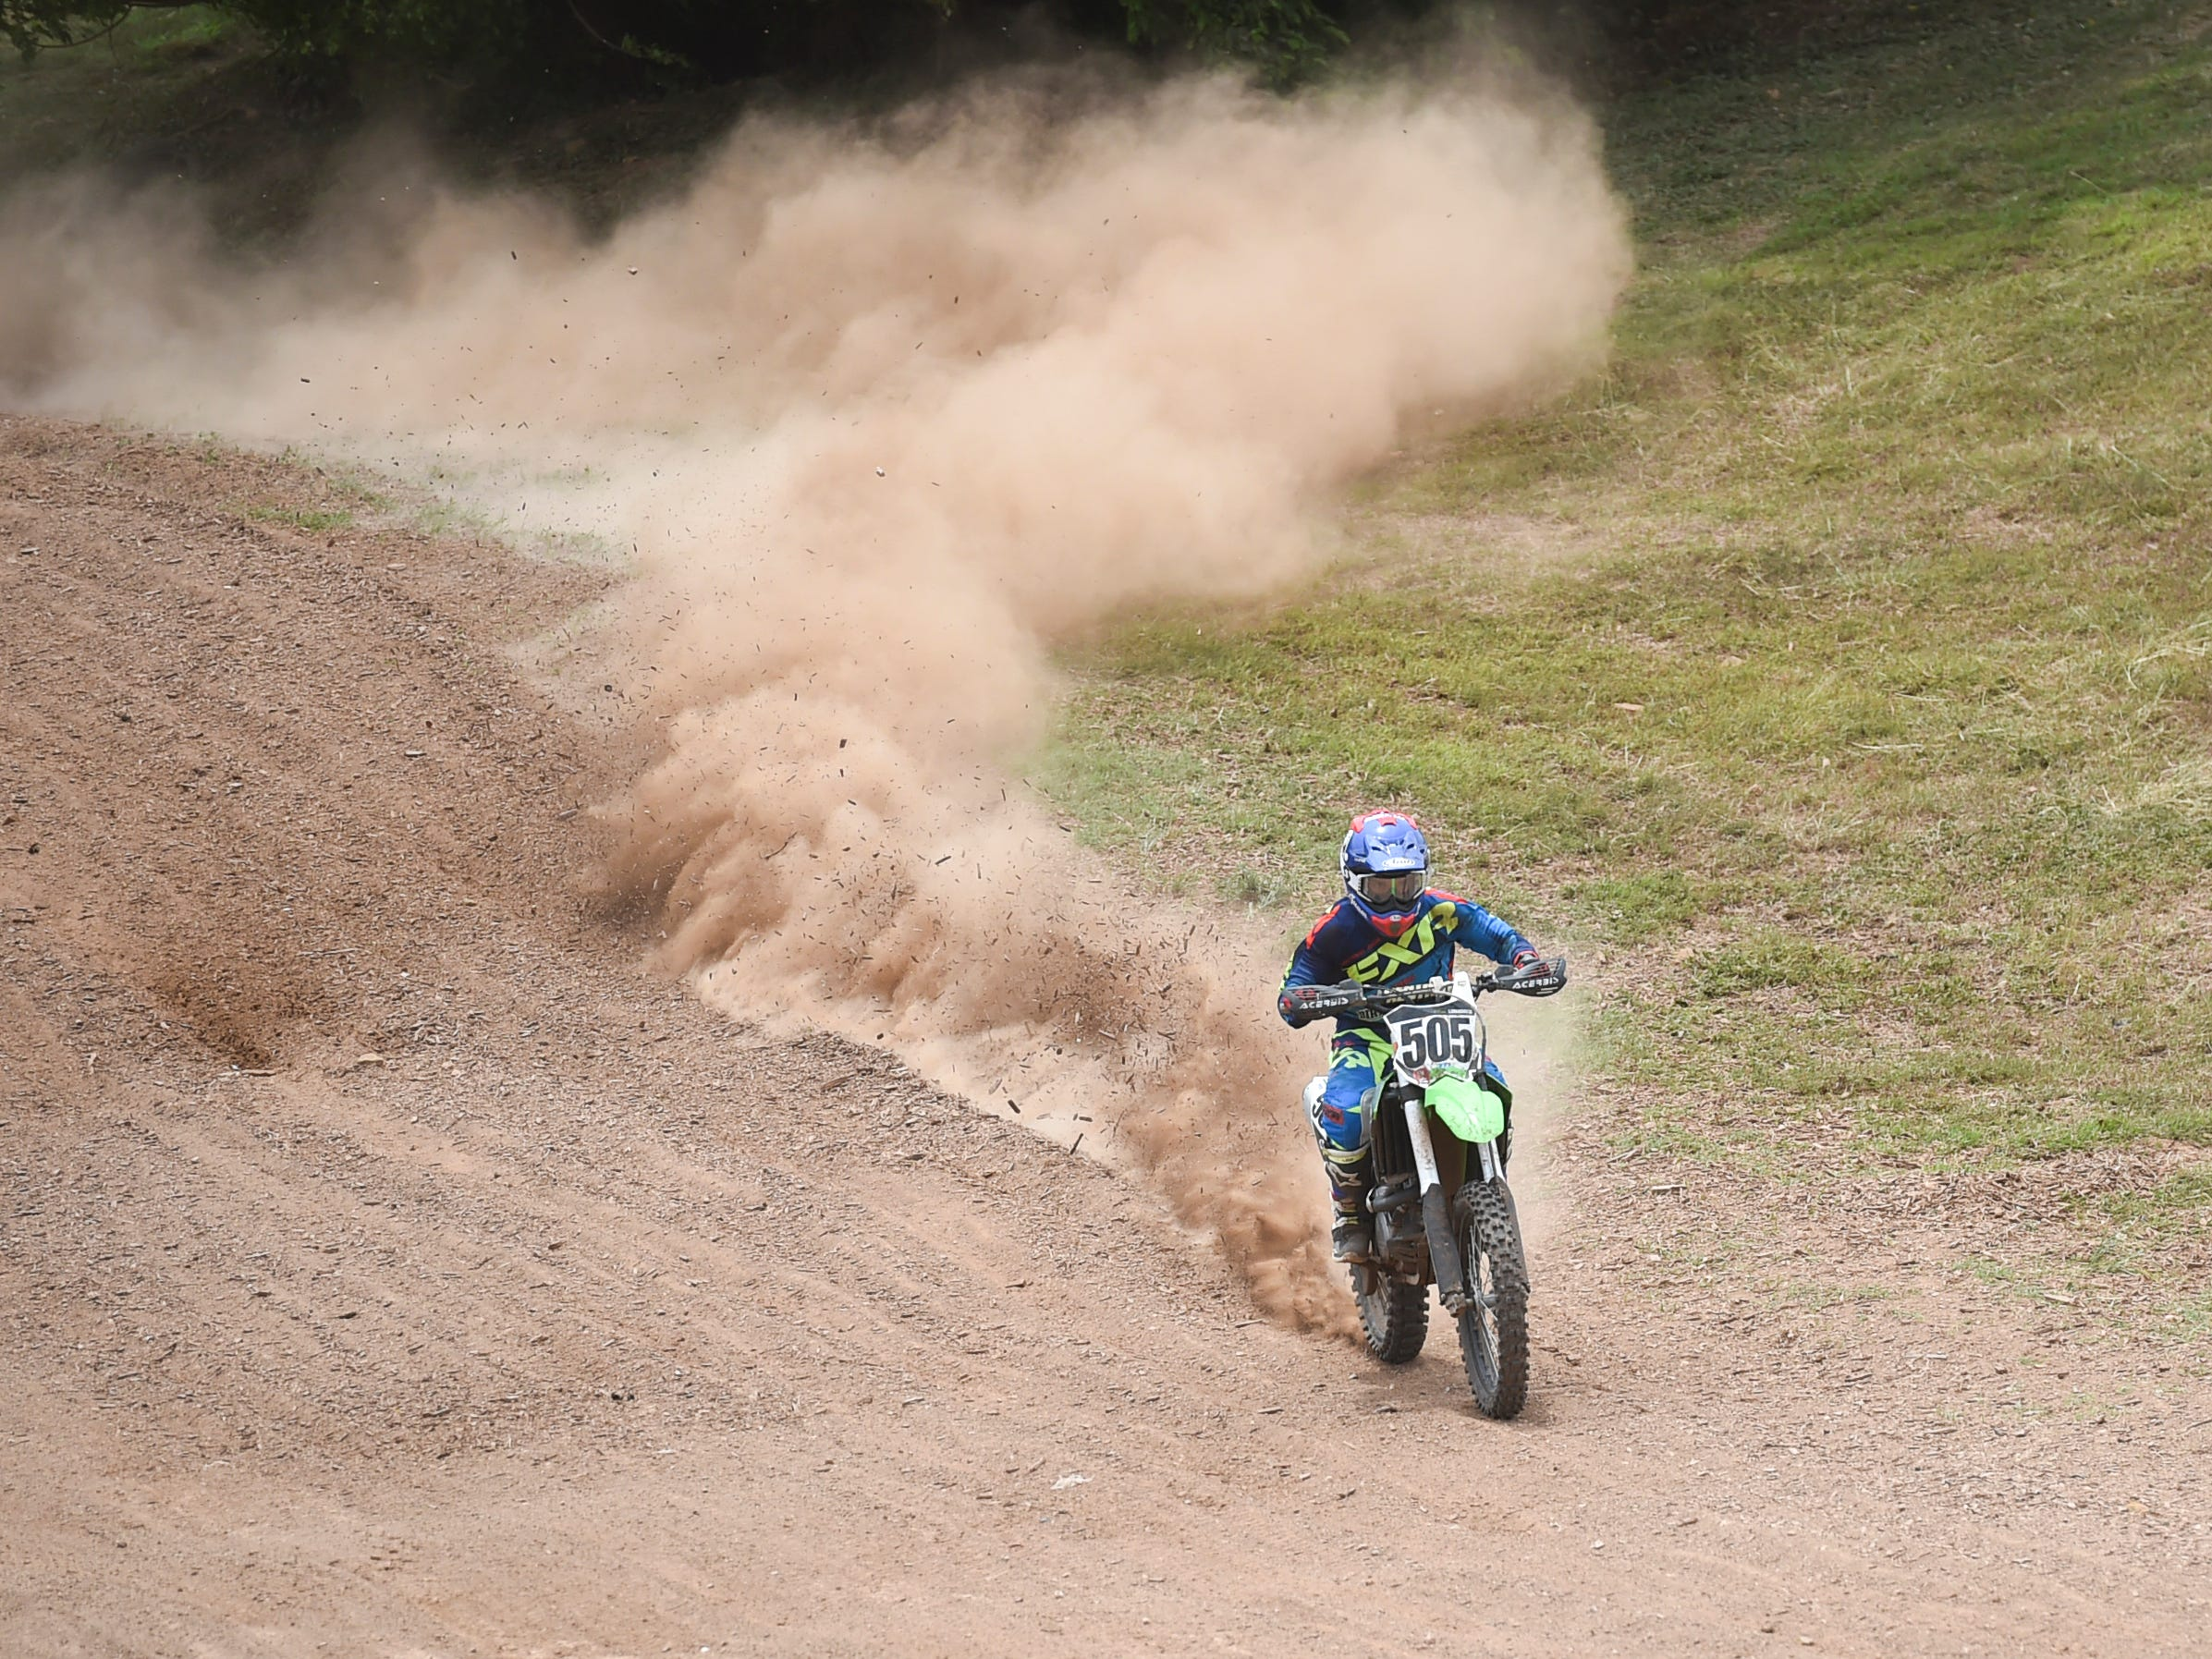 Motocross competitor Sean Lipanovich creates a dust trail during the 39th Annual APL Smokin' Wheels at the Guam International Raceway in Yigo, April 14, 2019.